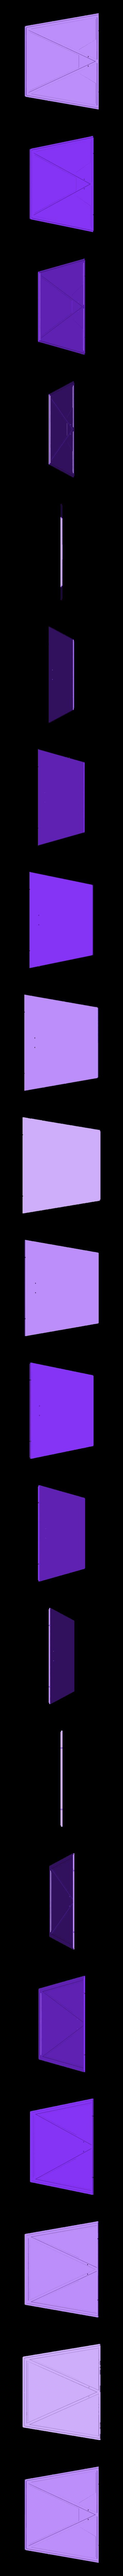 5b-Winglet_3S_Unten.STL Download free STL file StarWars TieFighter Gen1  • 3D printable template, Supeso